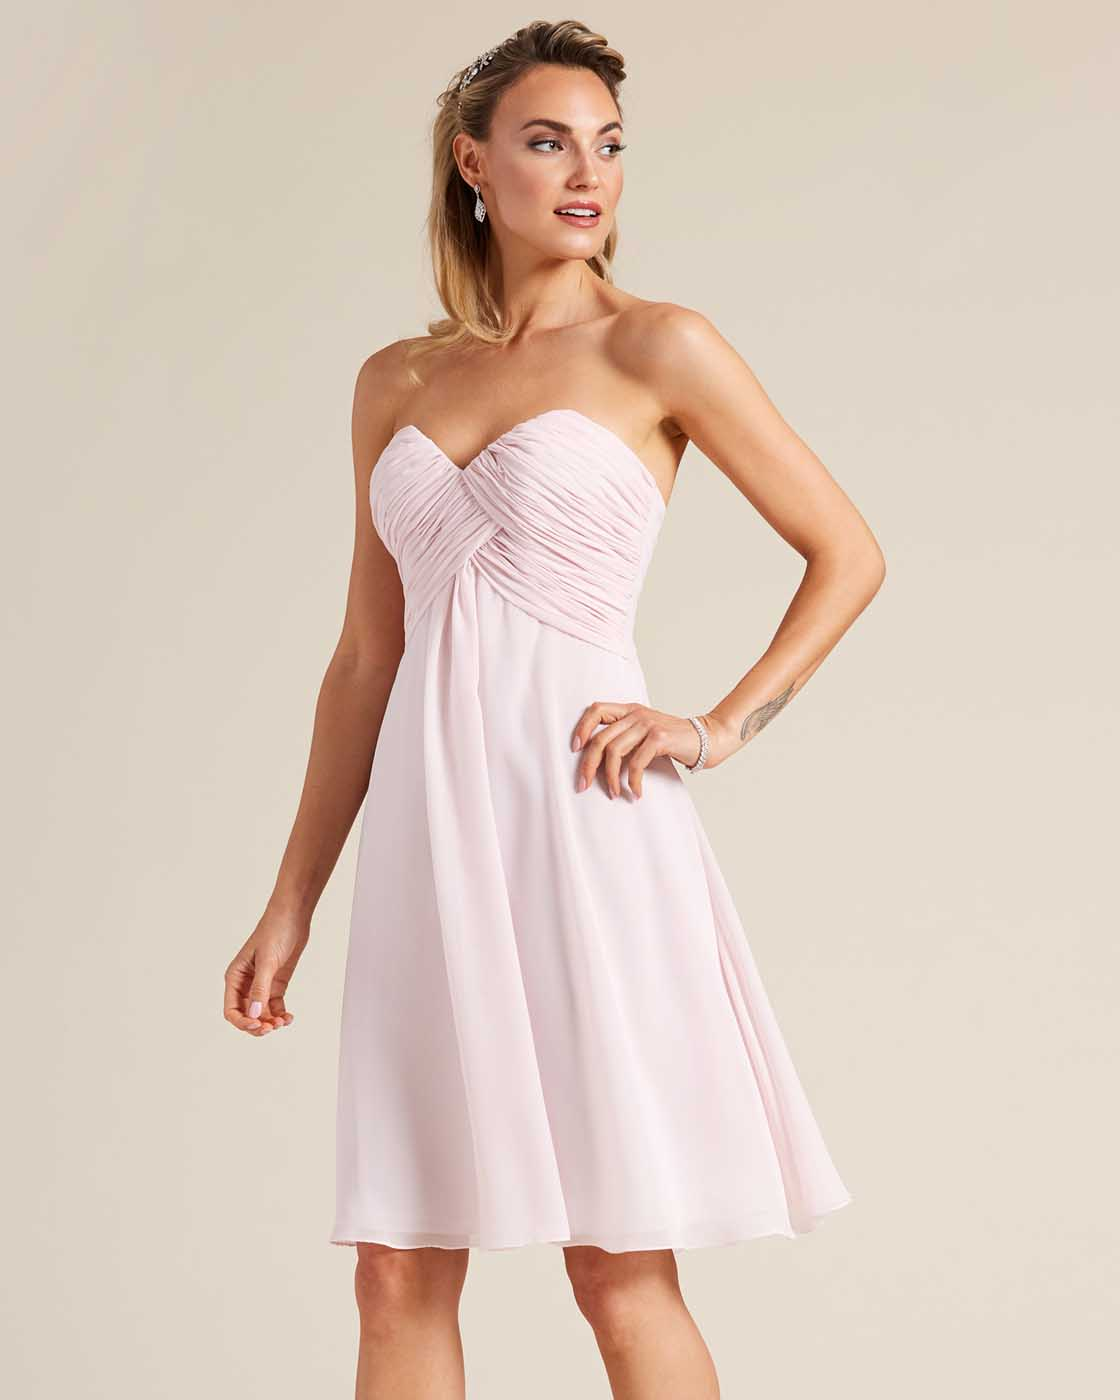 Pink Strapless Short Skirt Dress - Detail